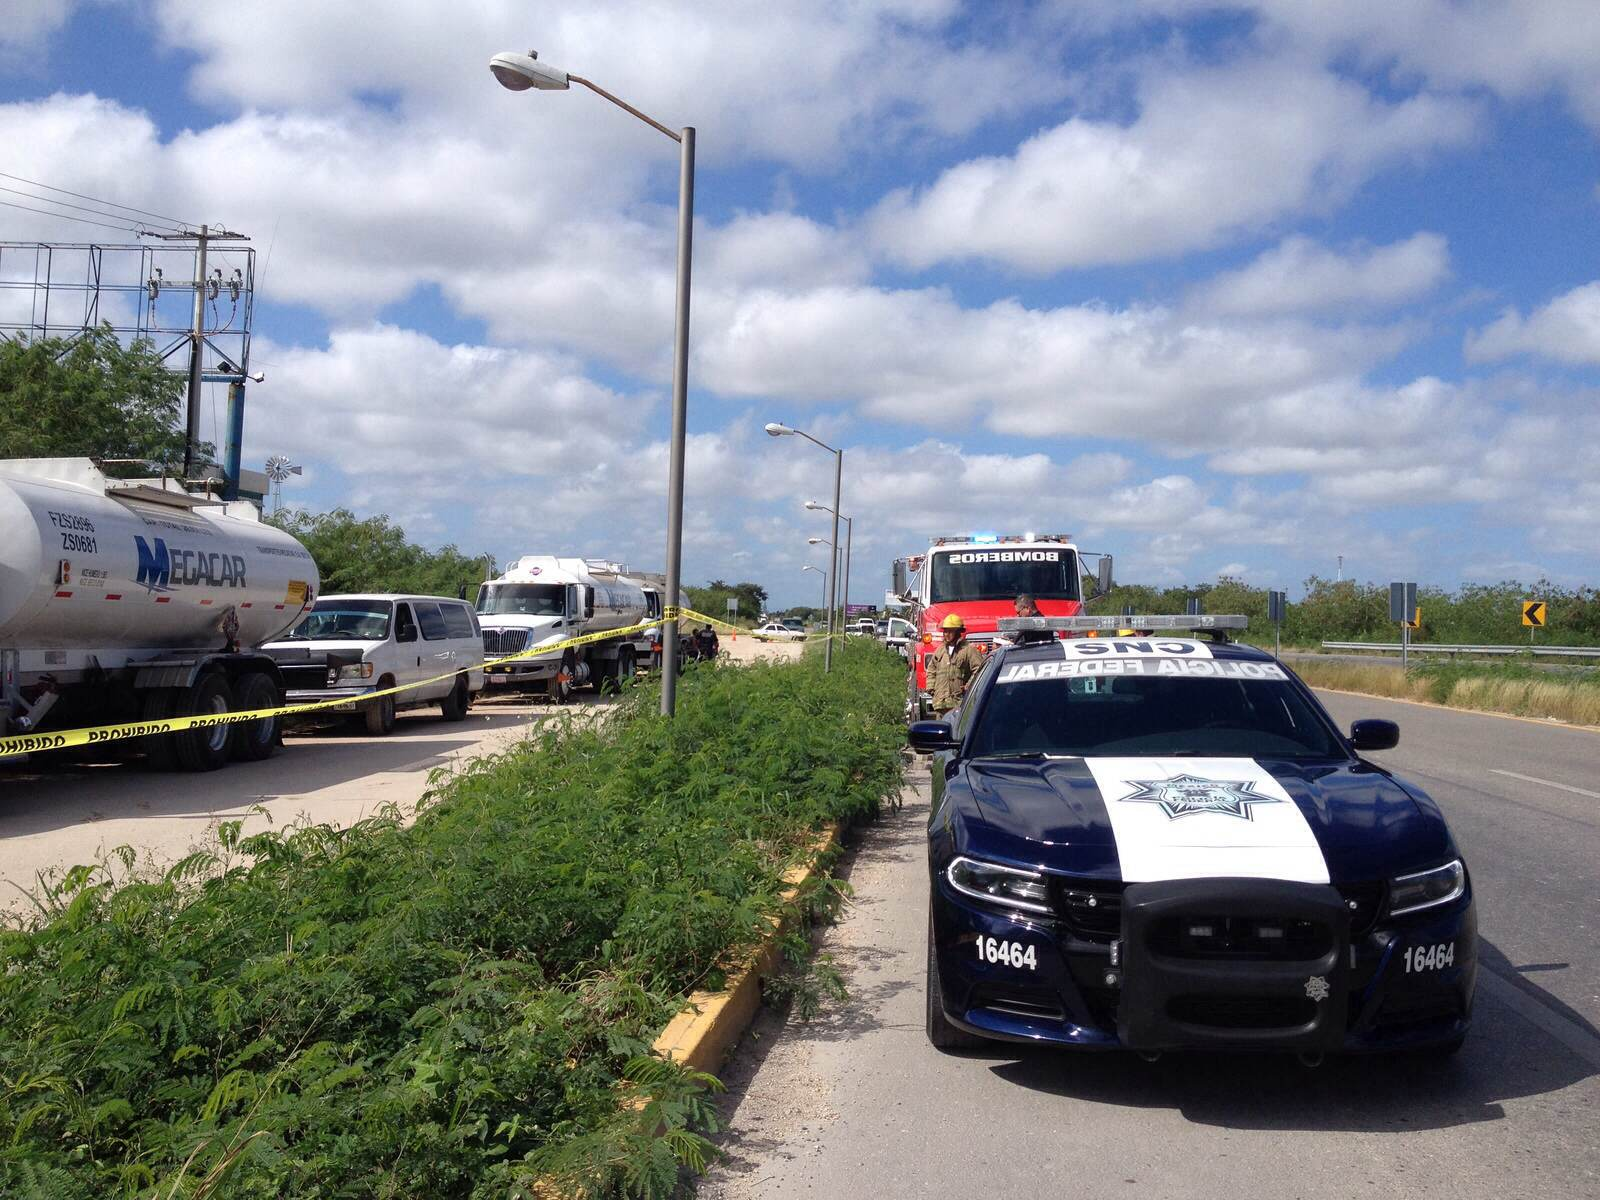 Detenidos por robo de gasolina